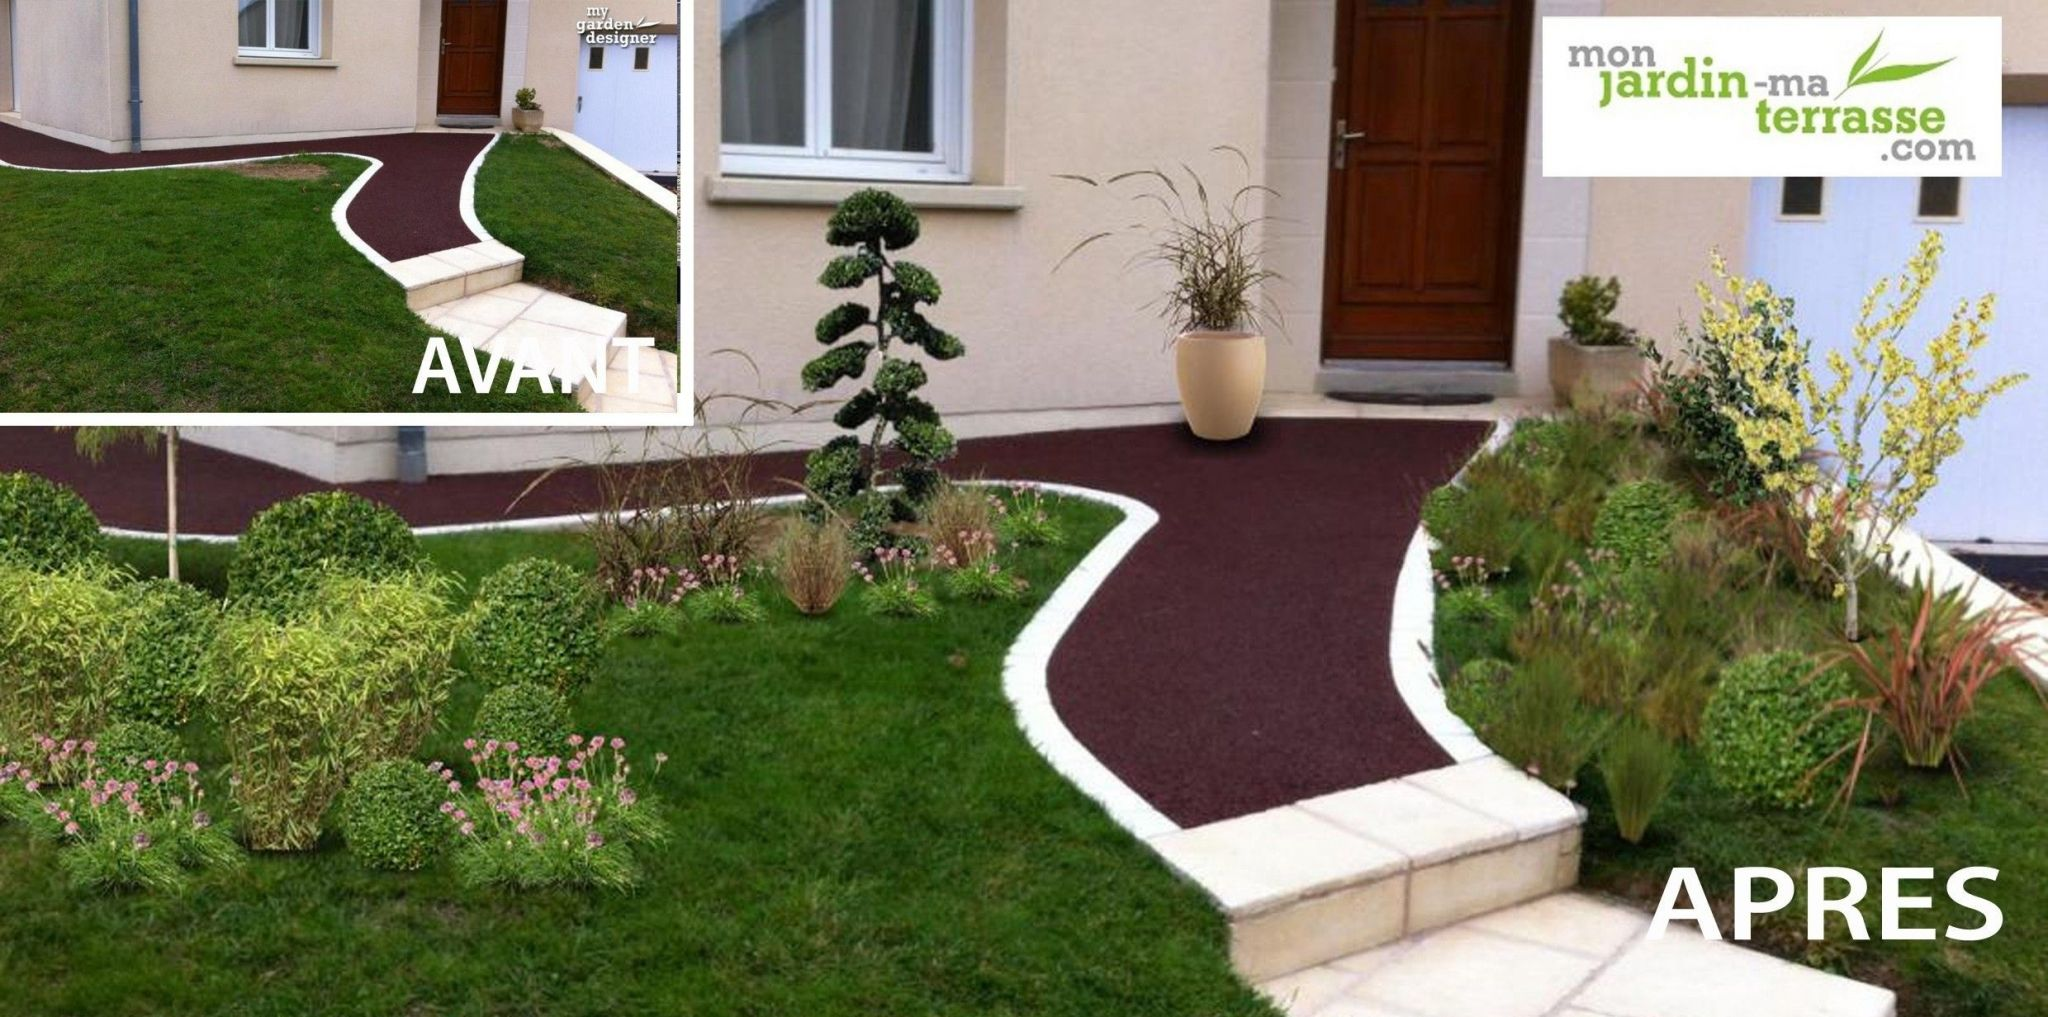 idee amenagement jardin mediterraneen avec idee amenagement jardin devant maison dcoration de extrieur de idee amenagement jardin mediterraneen